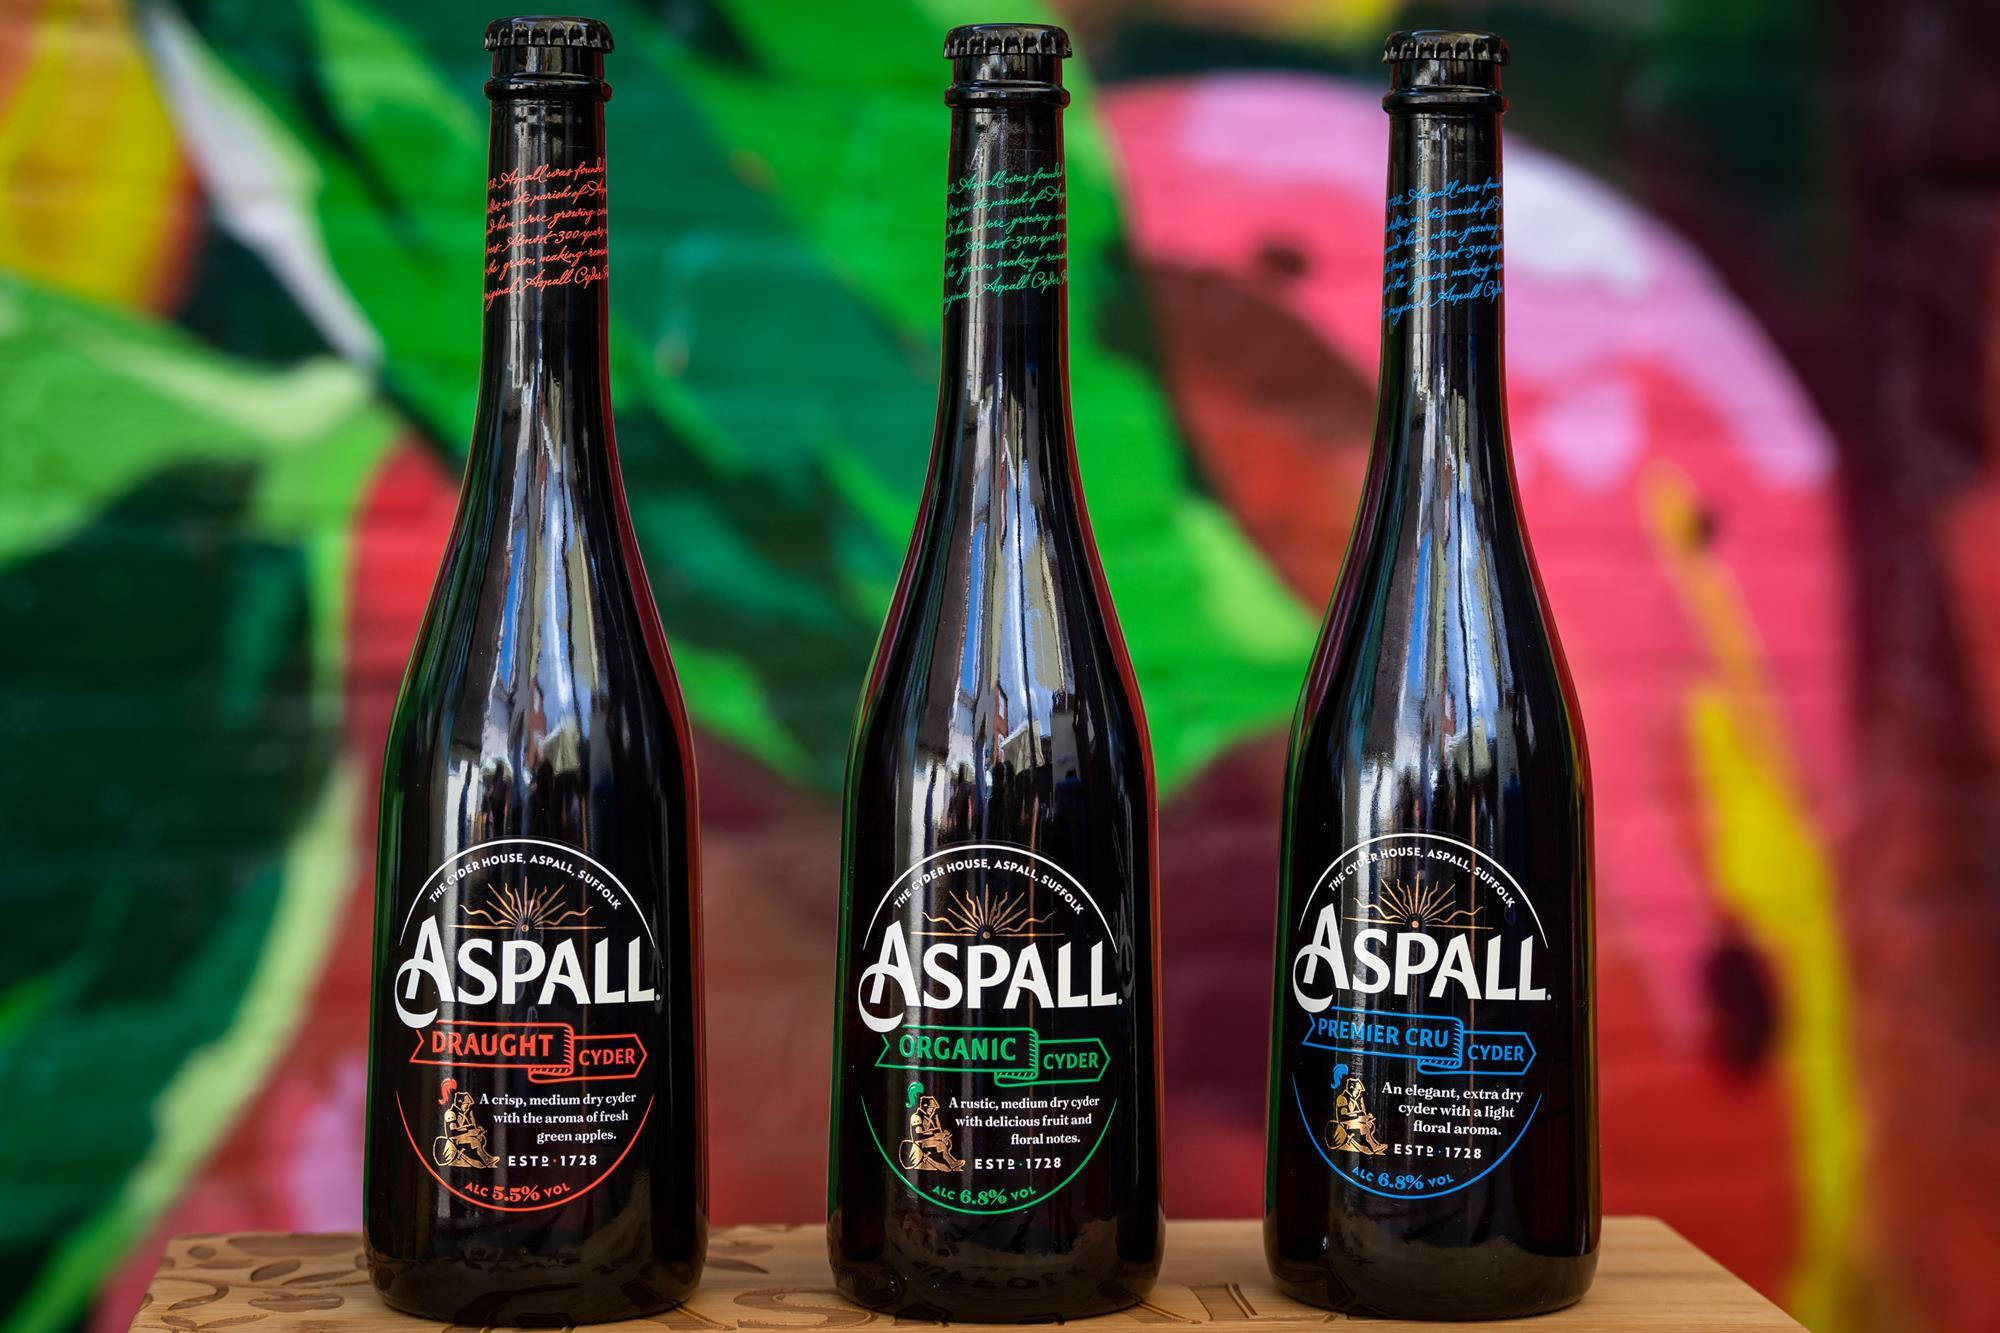 Aspall Cyder Brand Makeover Highlights Upmarket Credentials photo